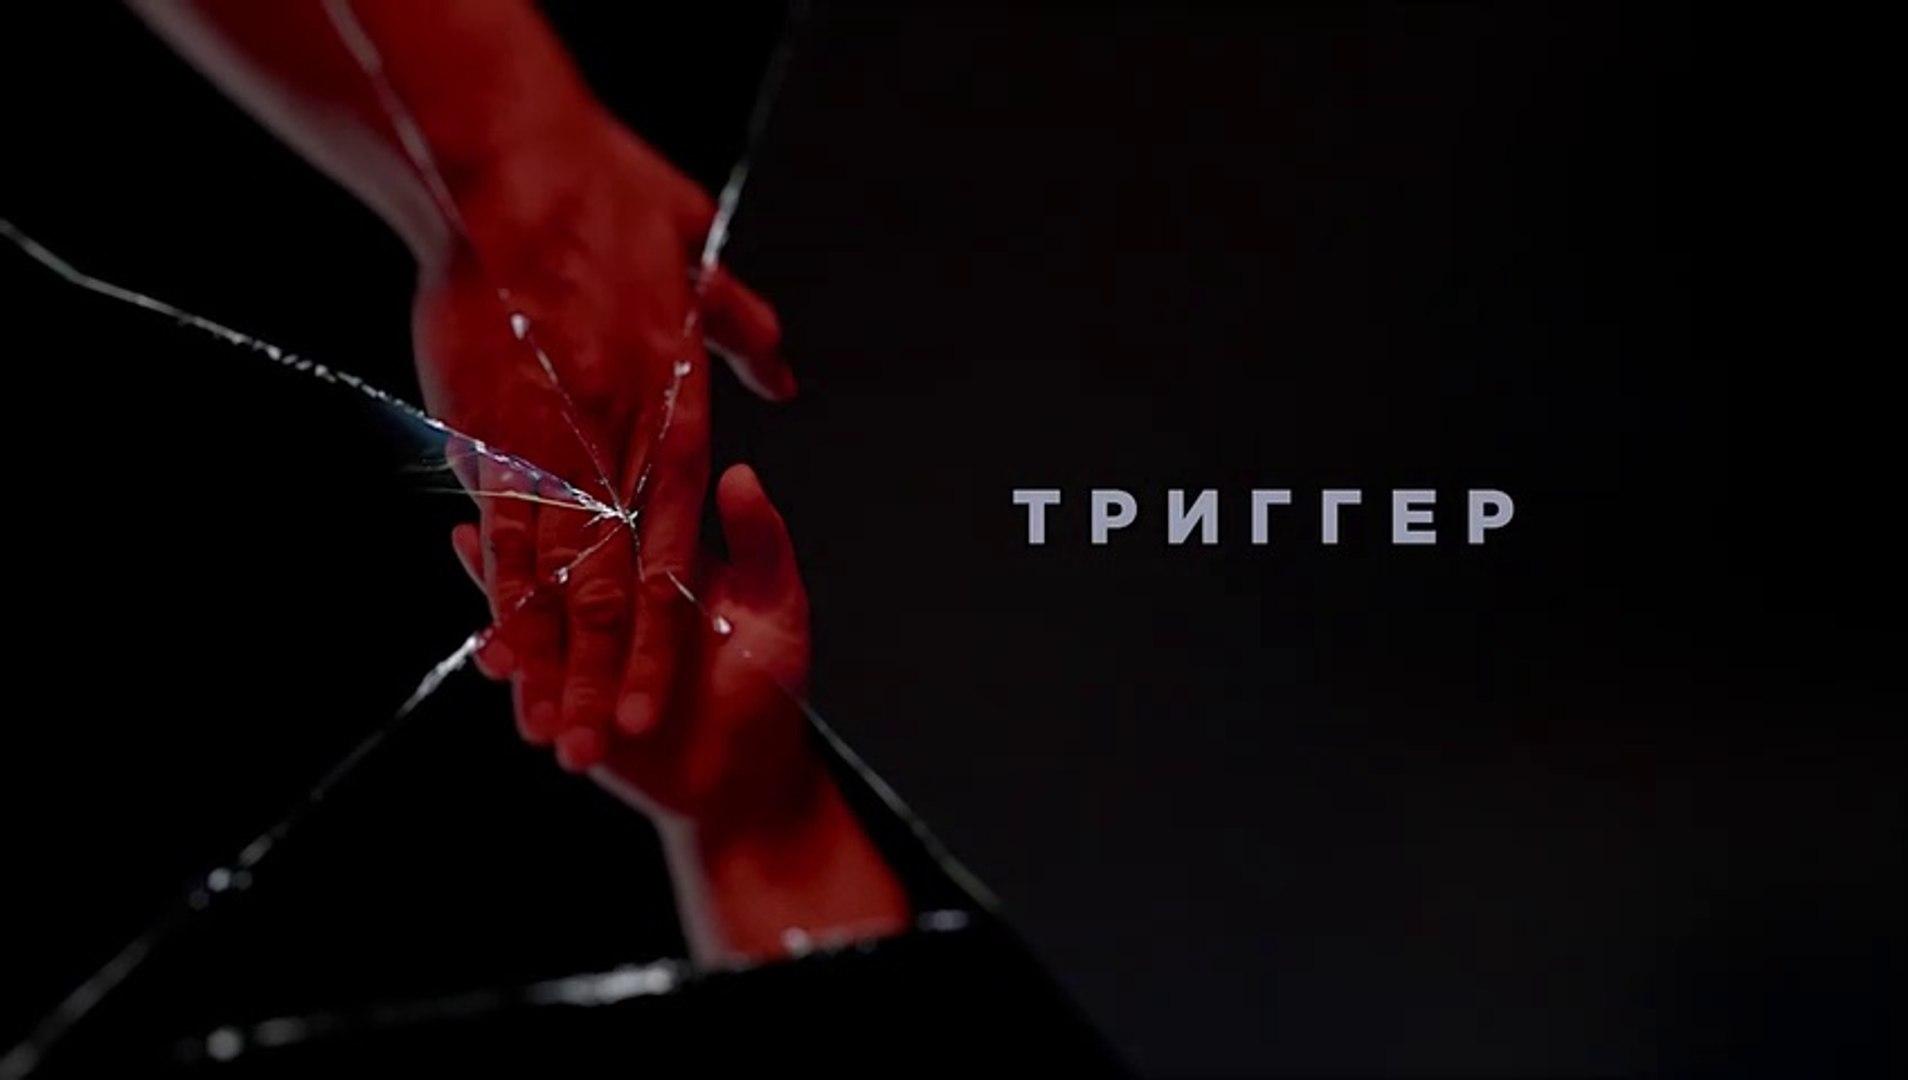 Триггер - 5 серия (2020) HD смотреть онлайн